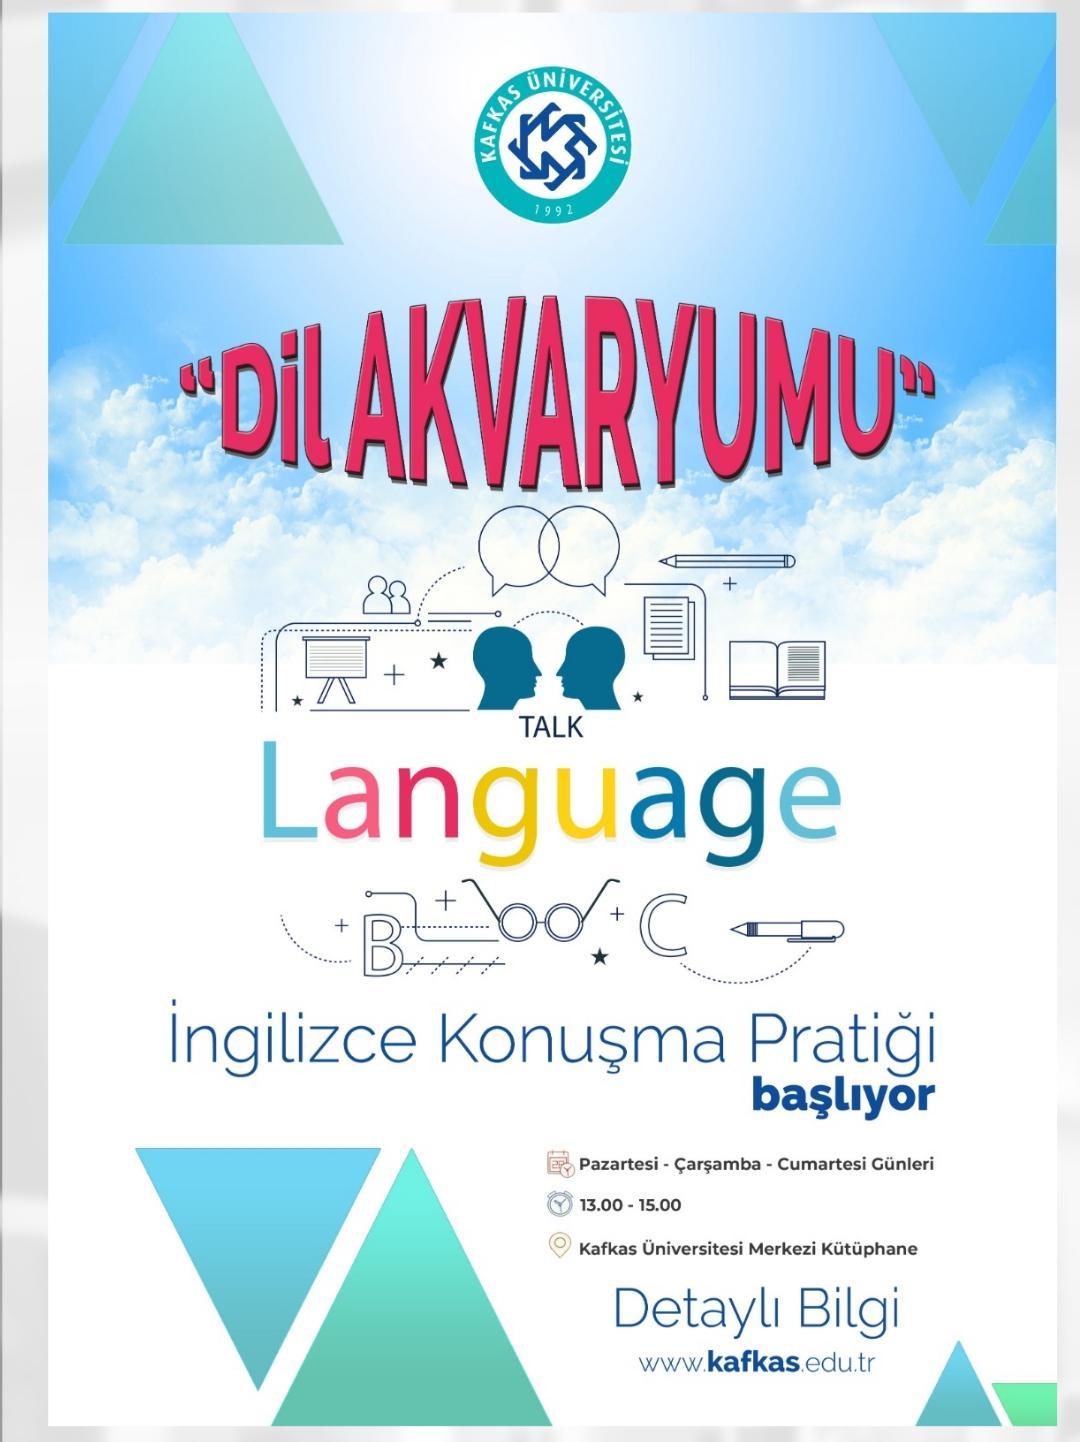 KAÜ'de Dil Akvaryumu faaliyete geçti